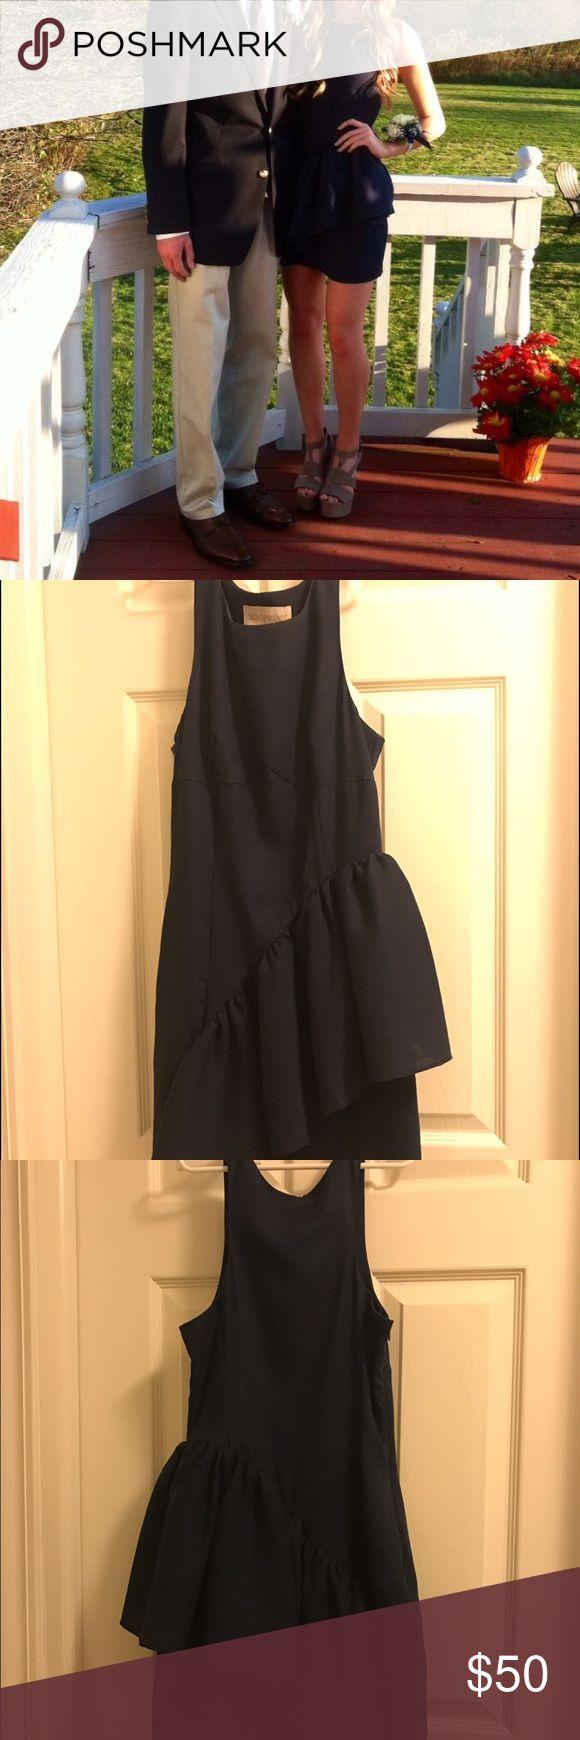 NWOT Keepsake The Label Navy Peplum Bodycon Dress color: navy / keepsake the label / size: xs / only worn once, a great homecoming dress Keepsake The Label Dresses Mini